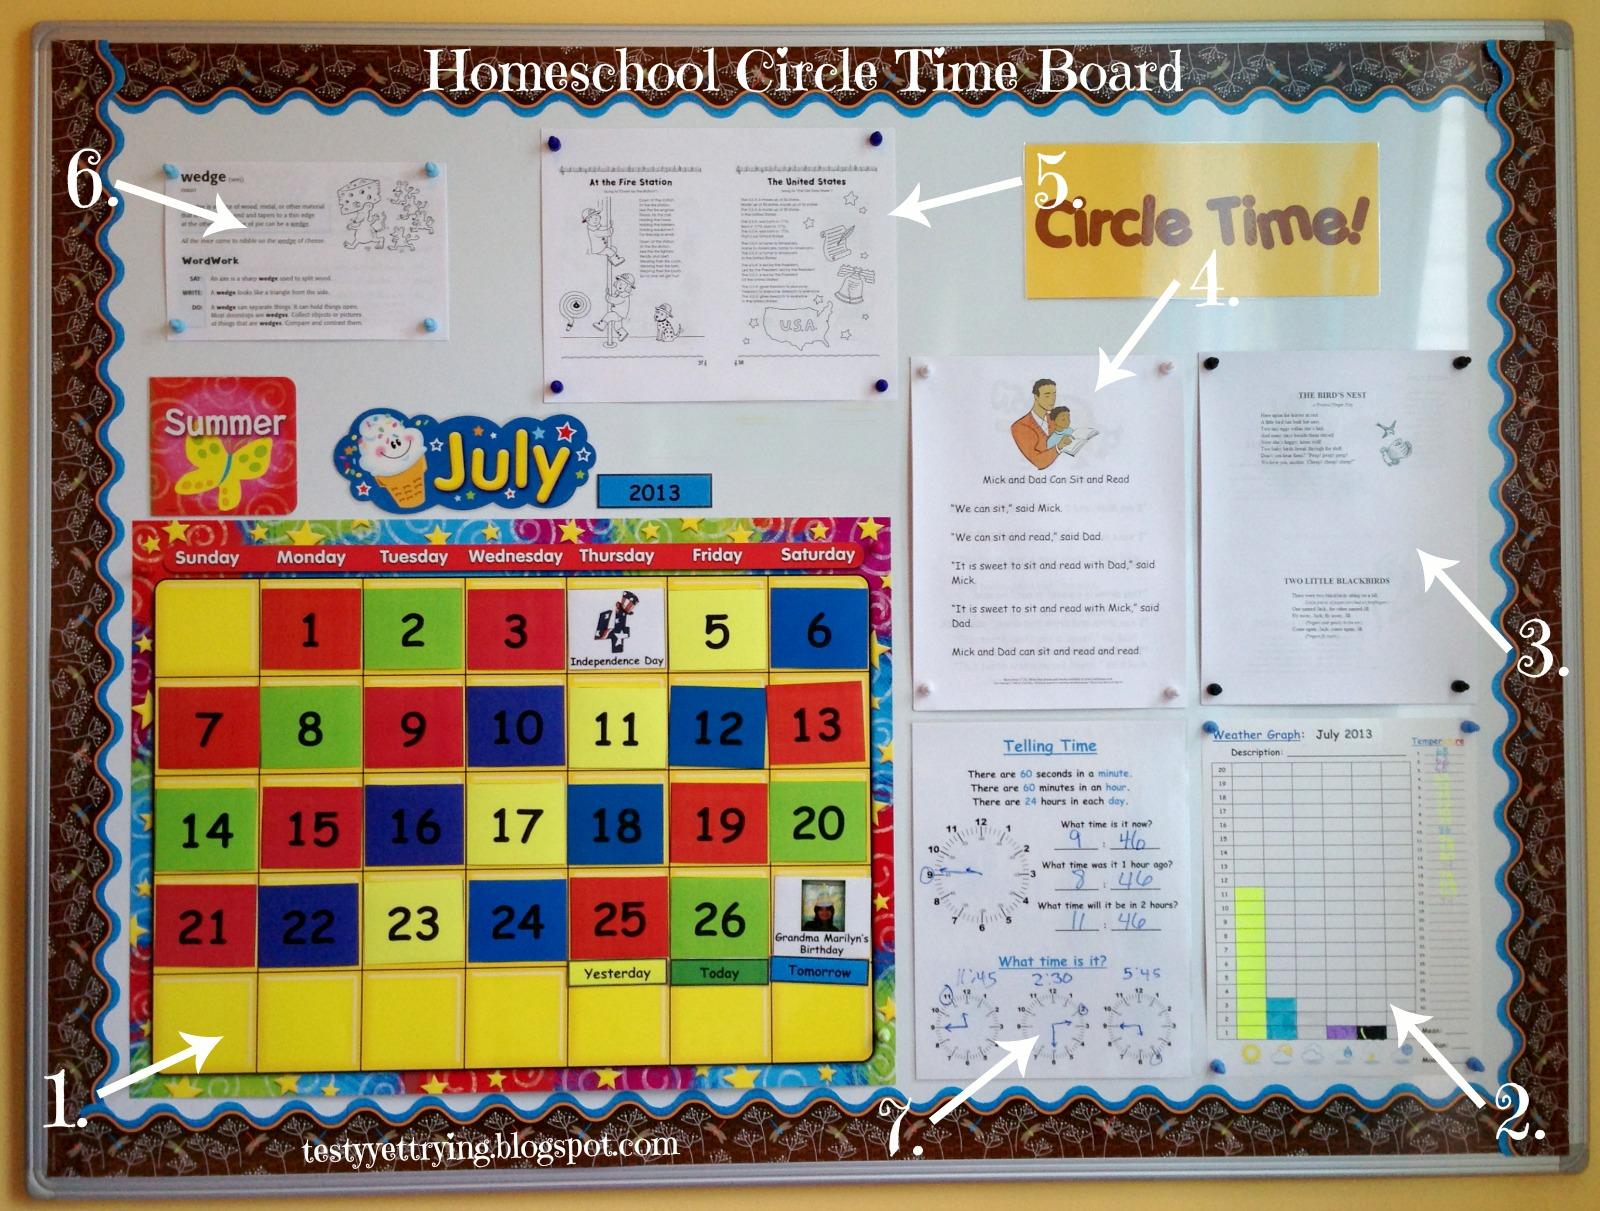 Testy Yet Trying Homeschool Circle Time